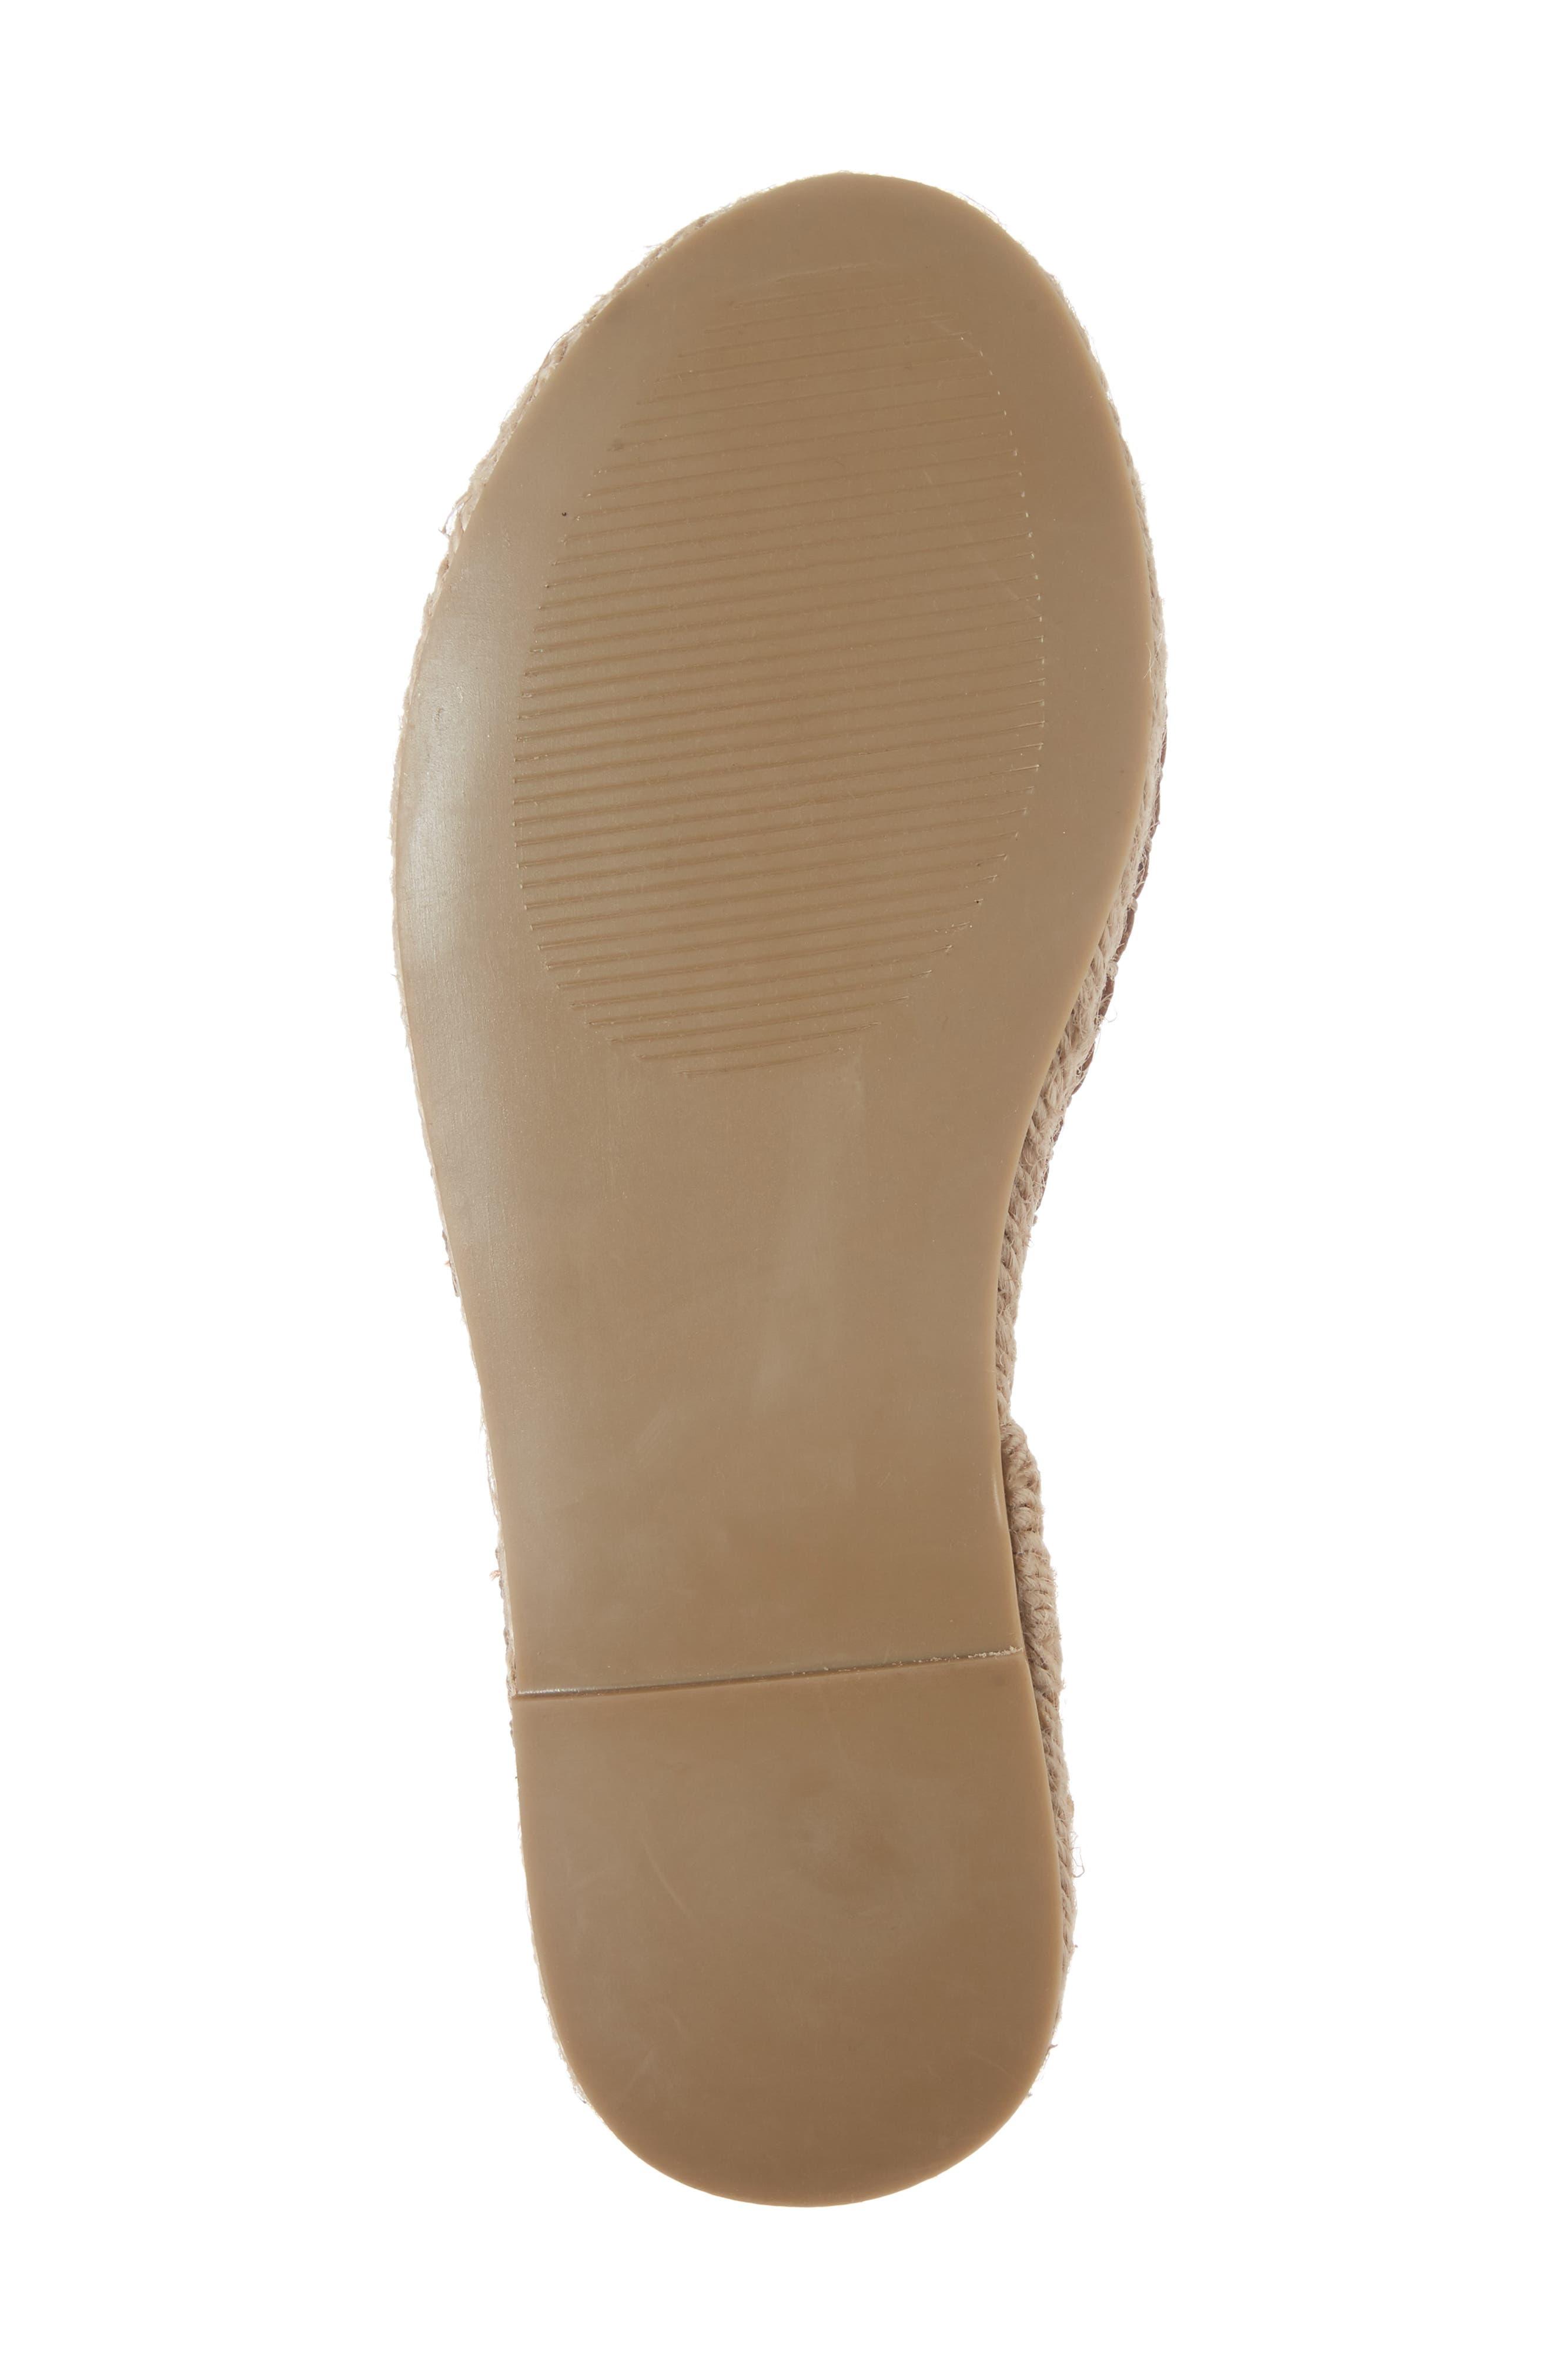 Clover Ankle Wrap Espadrille Sandal,                             Alternate thumbnail 6, color,                             212